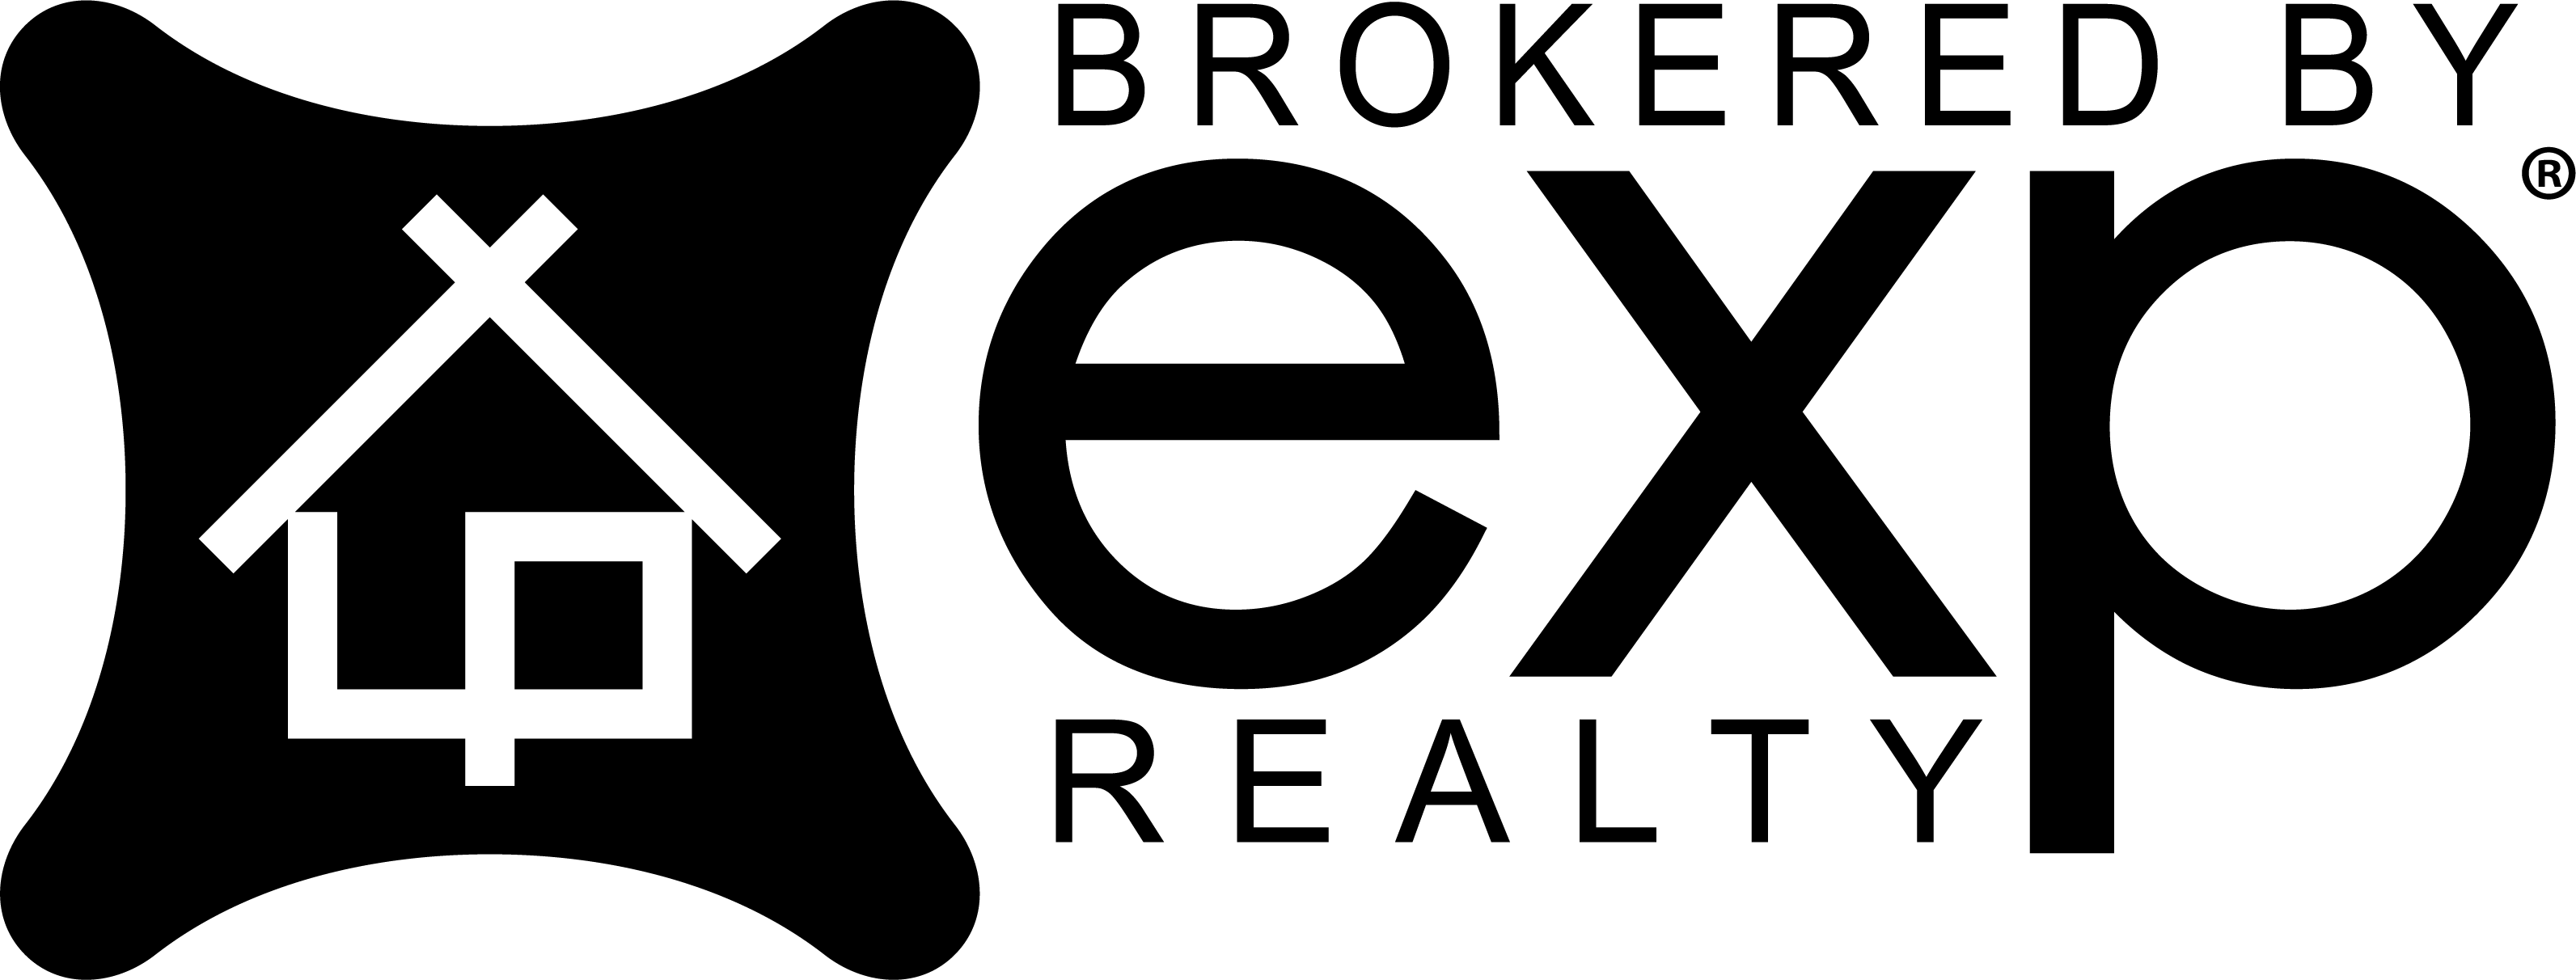 LivingTN logo